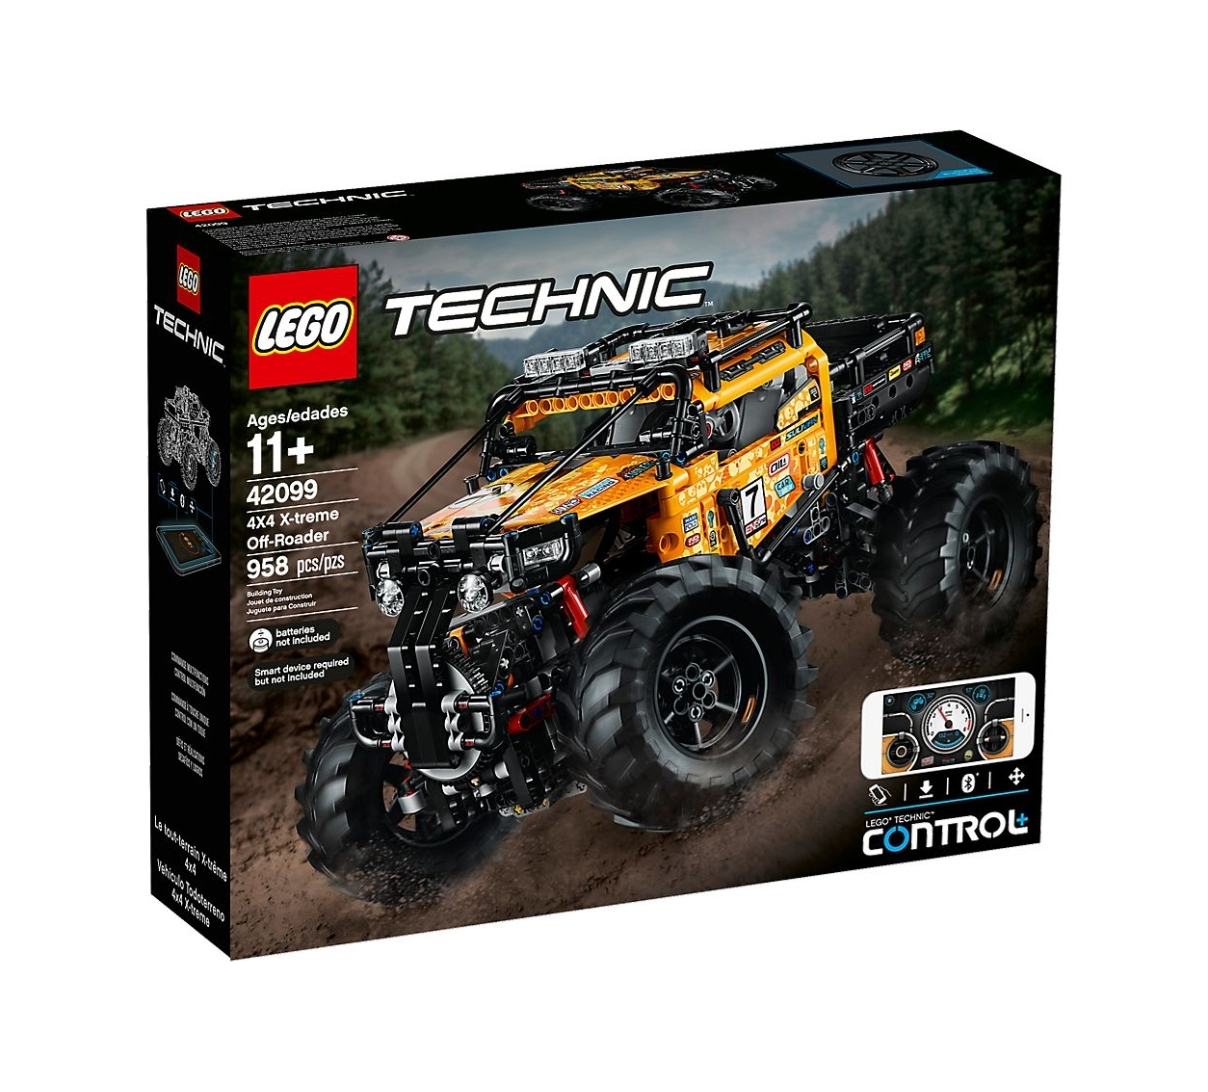 Lego Technic: 4X4 X-treme Off-Roader 42099